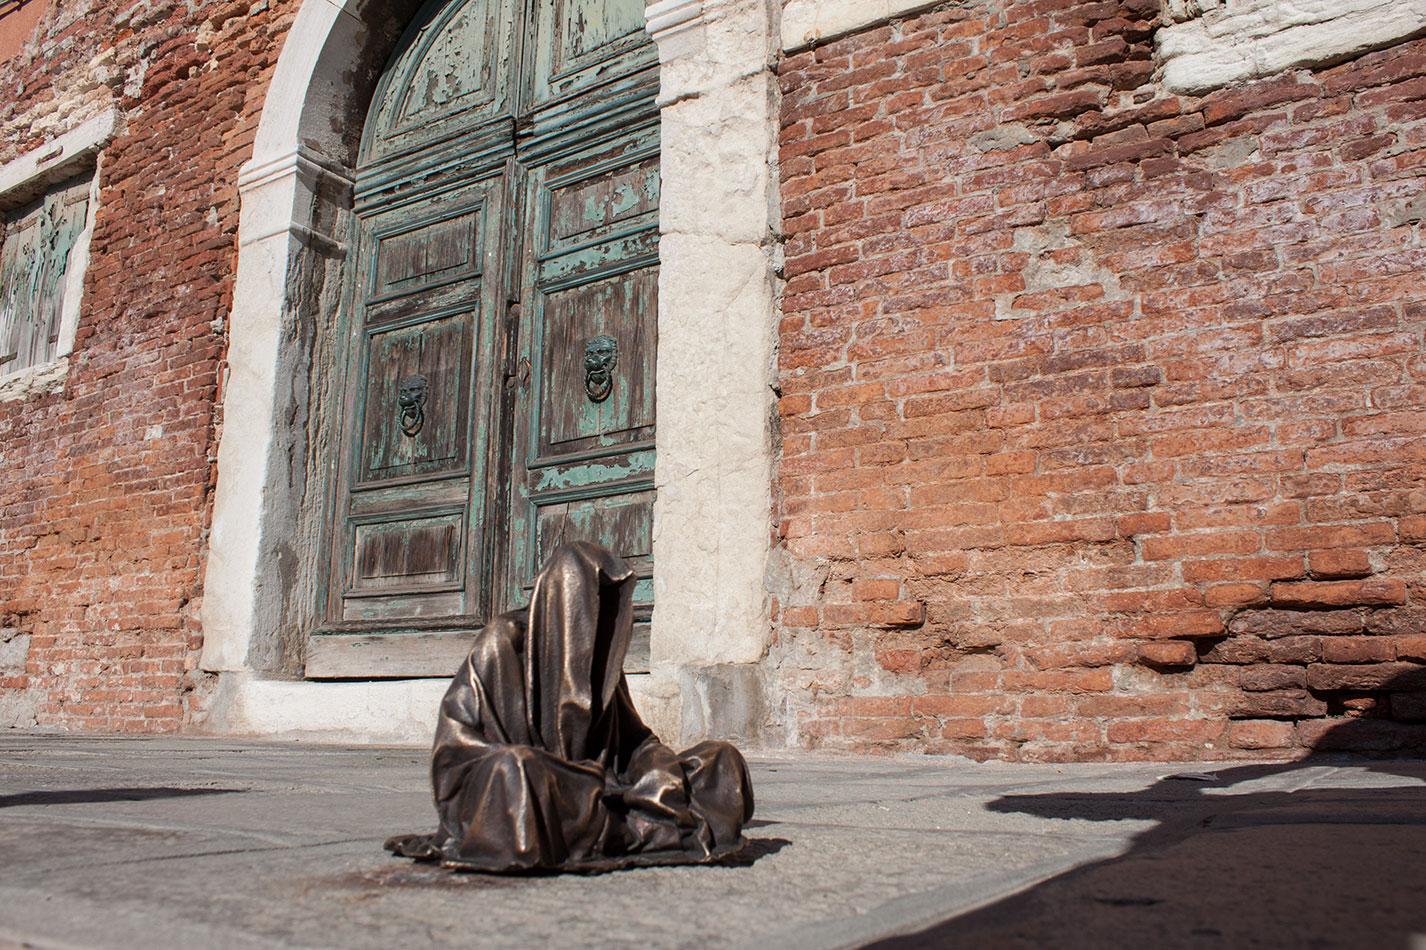 murano-glass-berengo-studio-venice-contemporary-art-arts-design-sculpture-guardians-of-time-manfred-kili-kielnhofer-8295